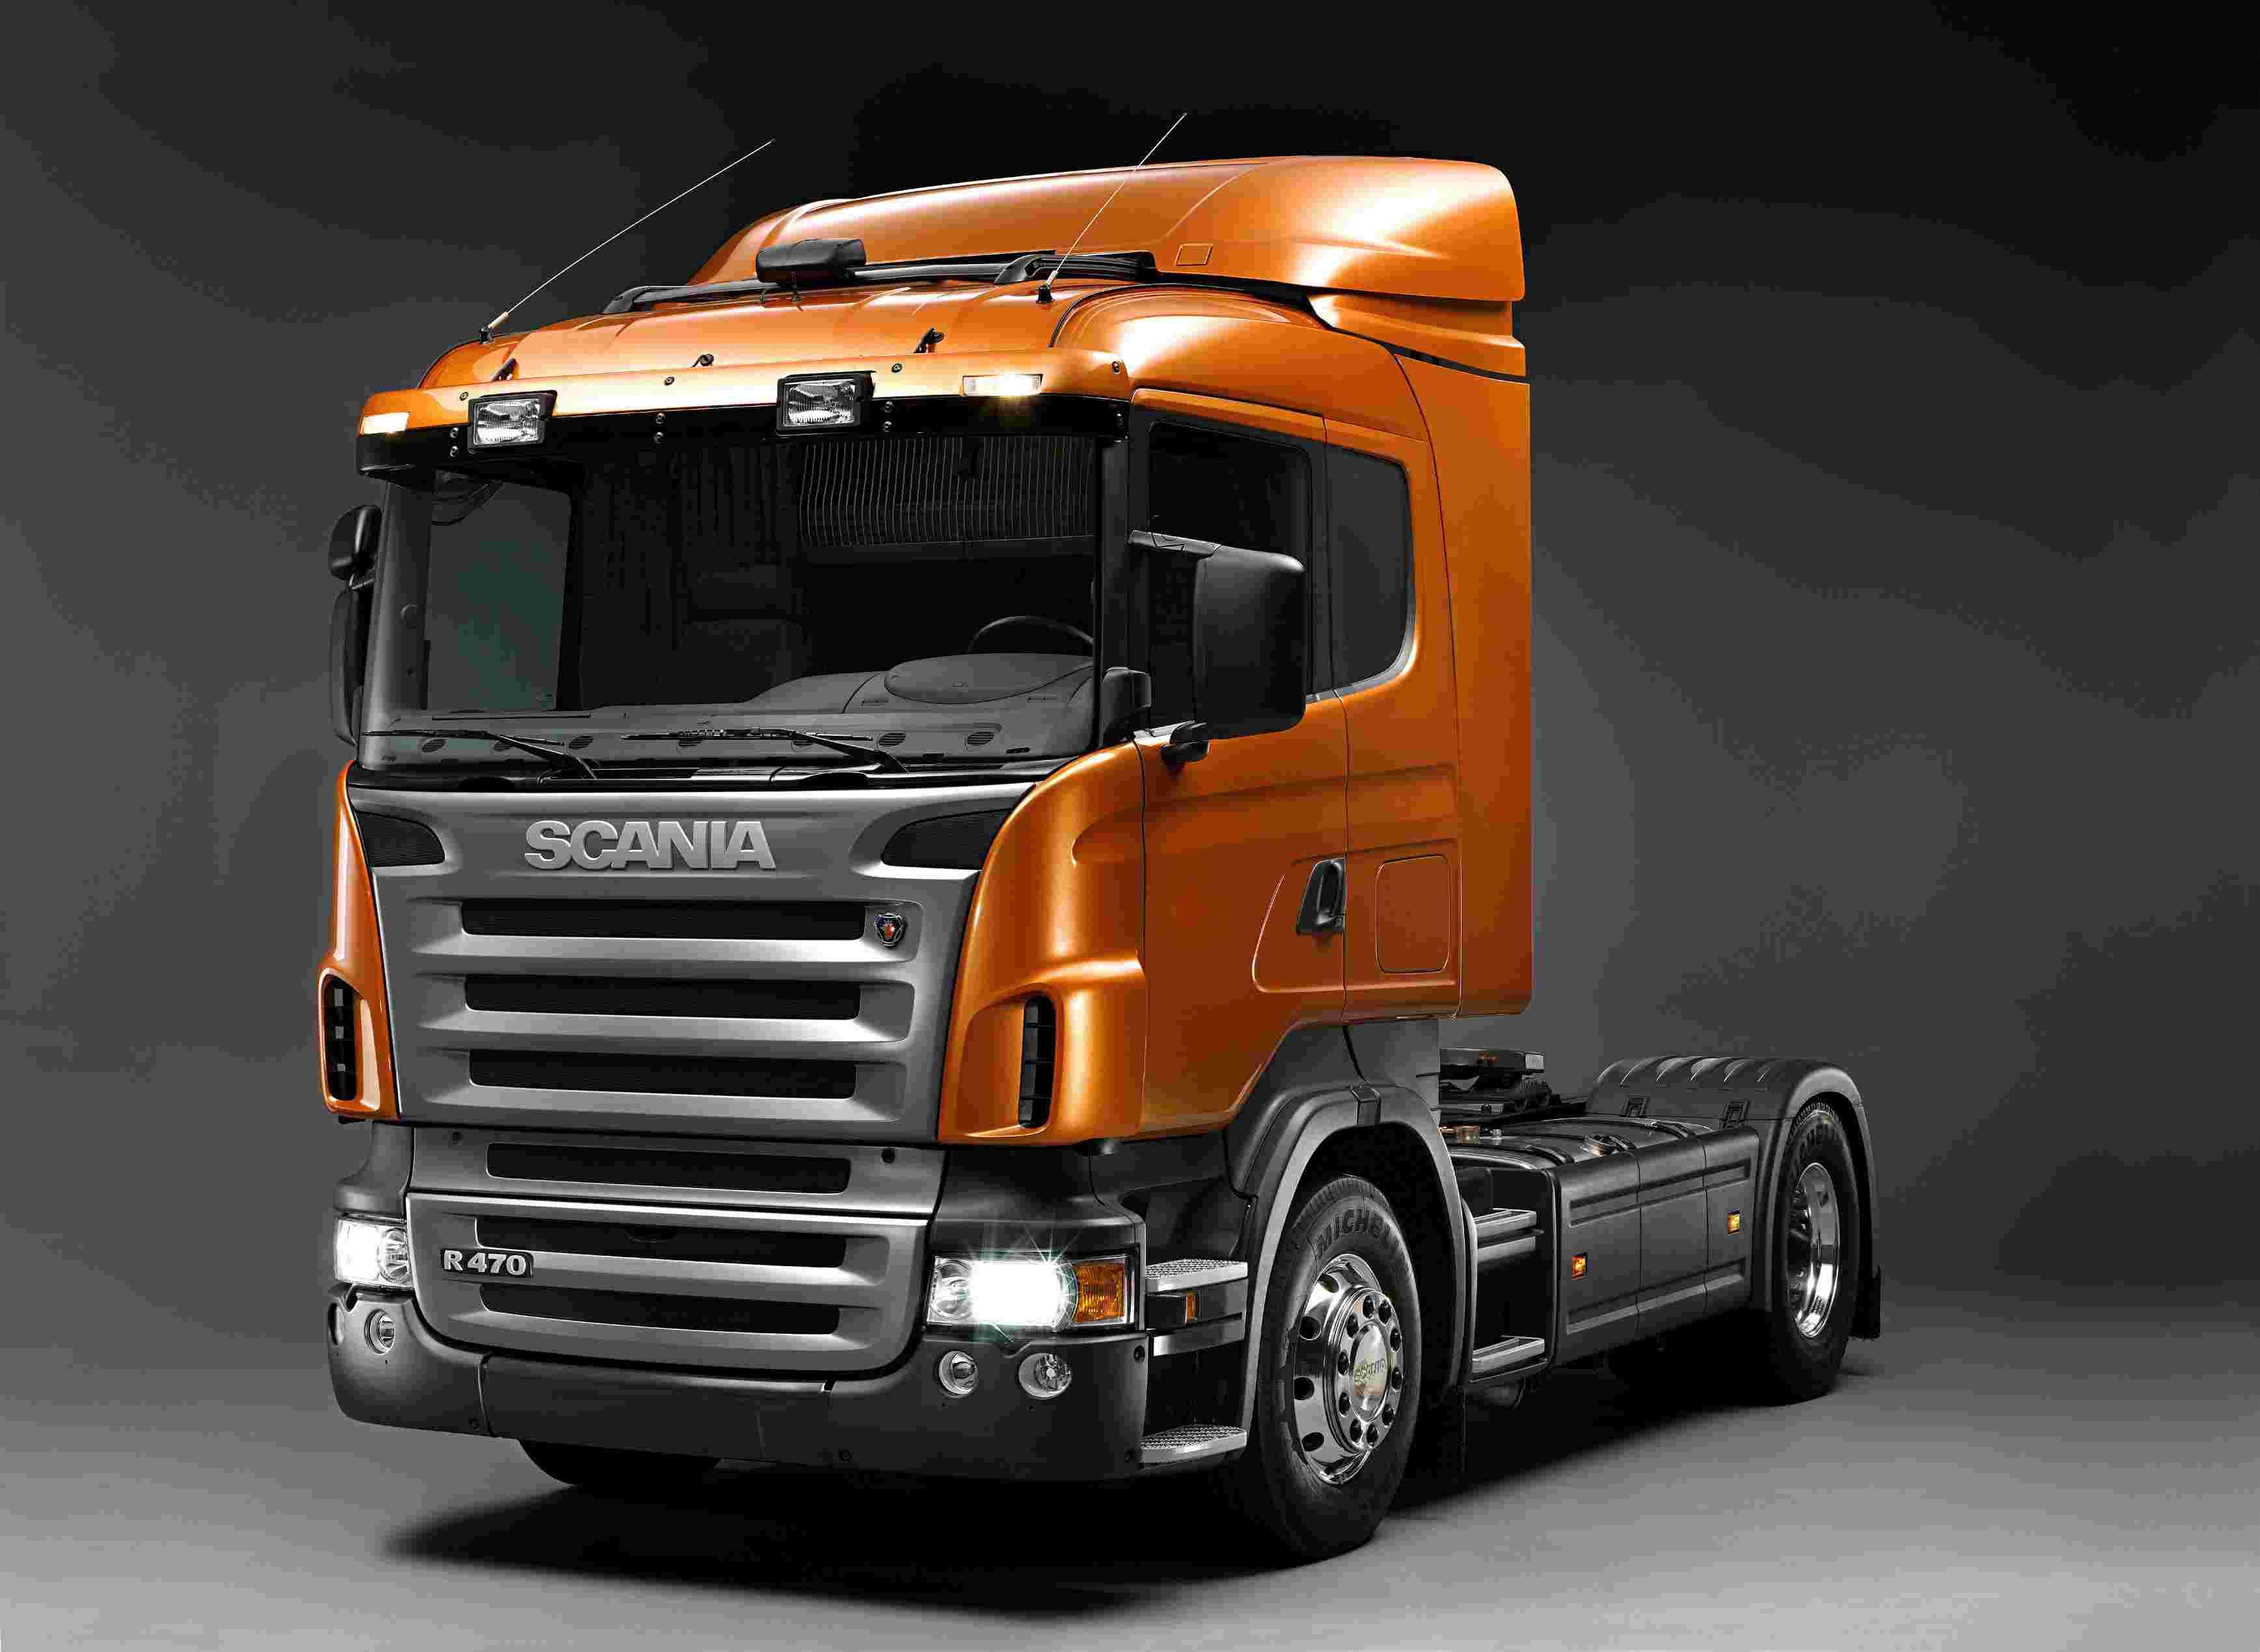 Scania Truck Cartoon Trucks Wallpapers 3473x2539